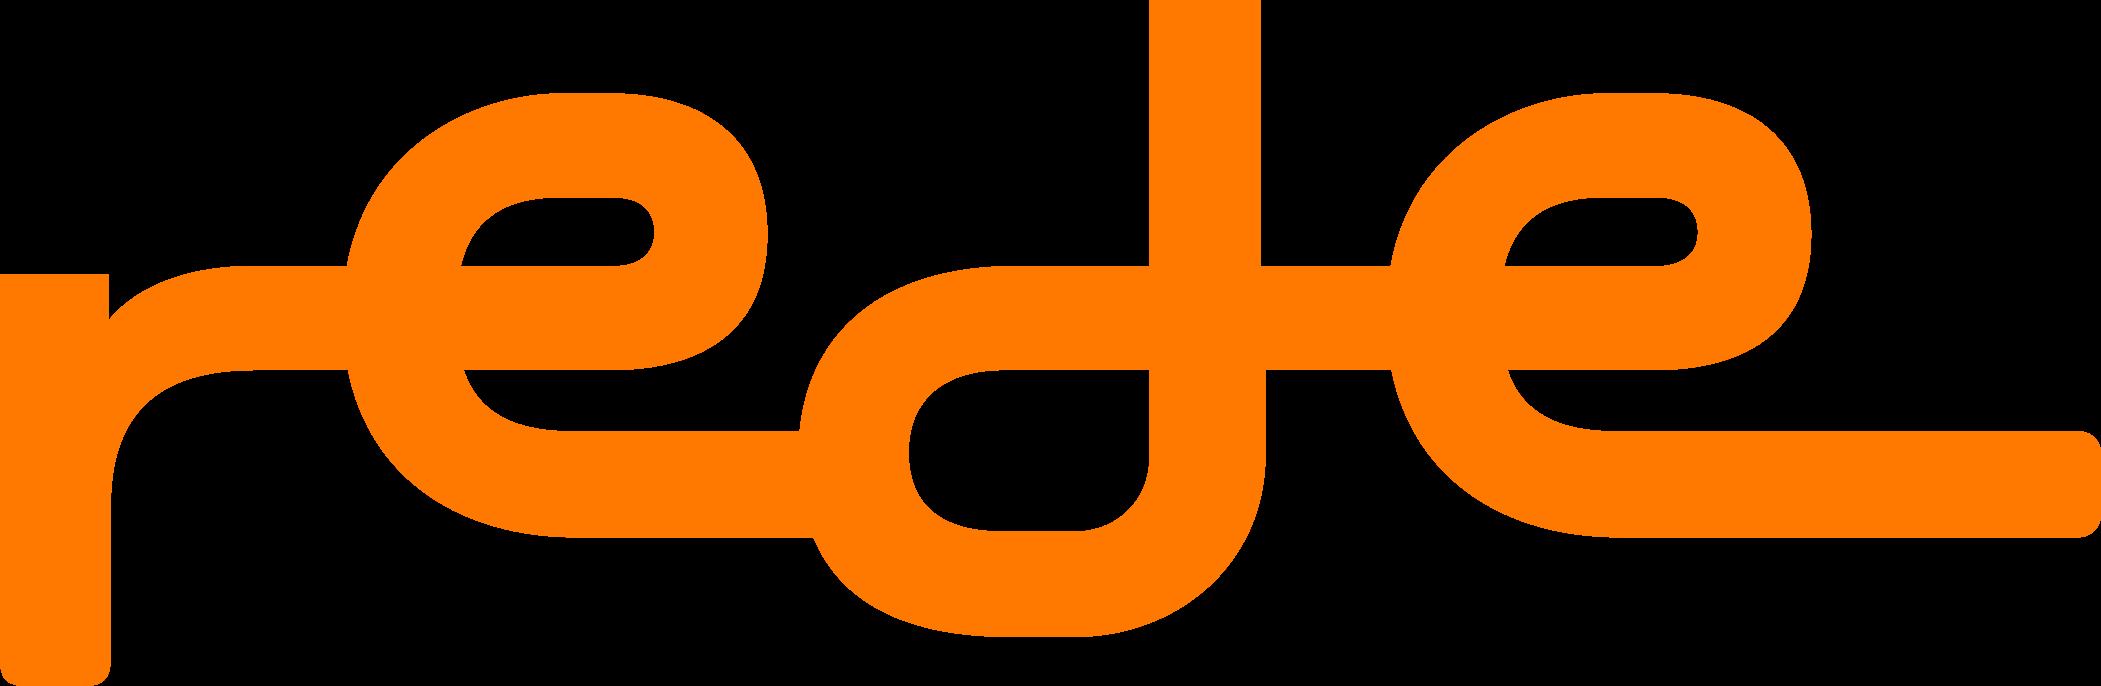 Rede Logo.